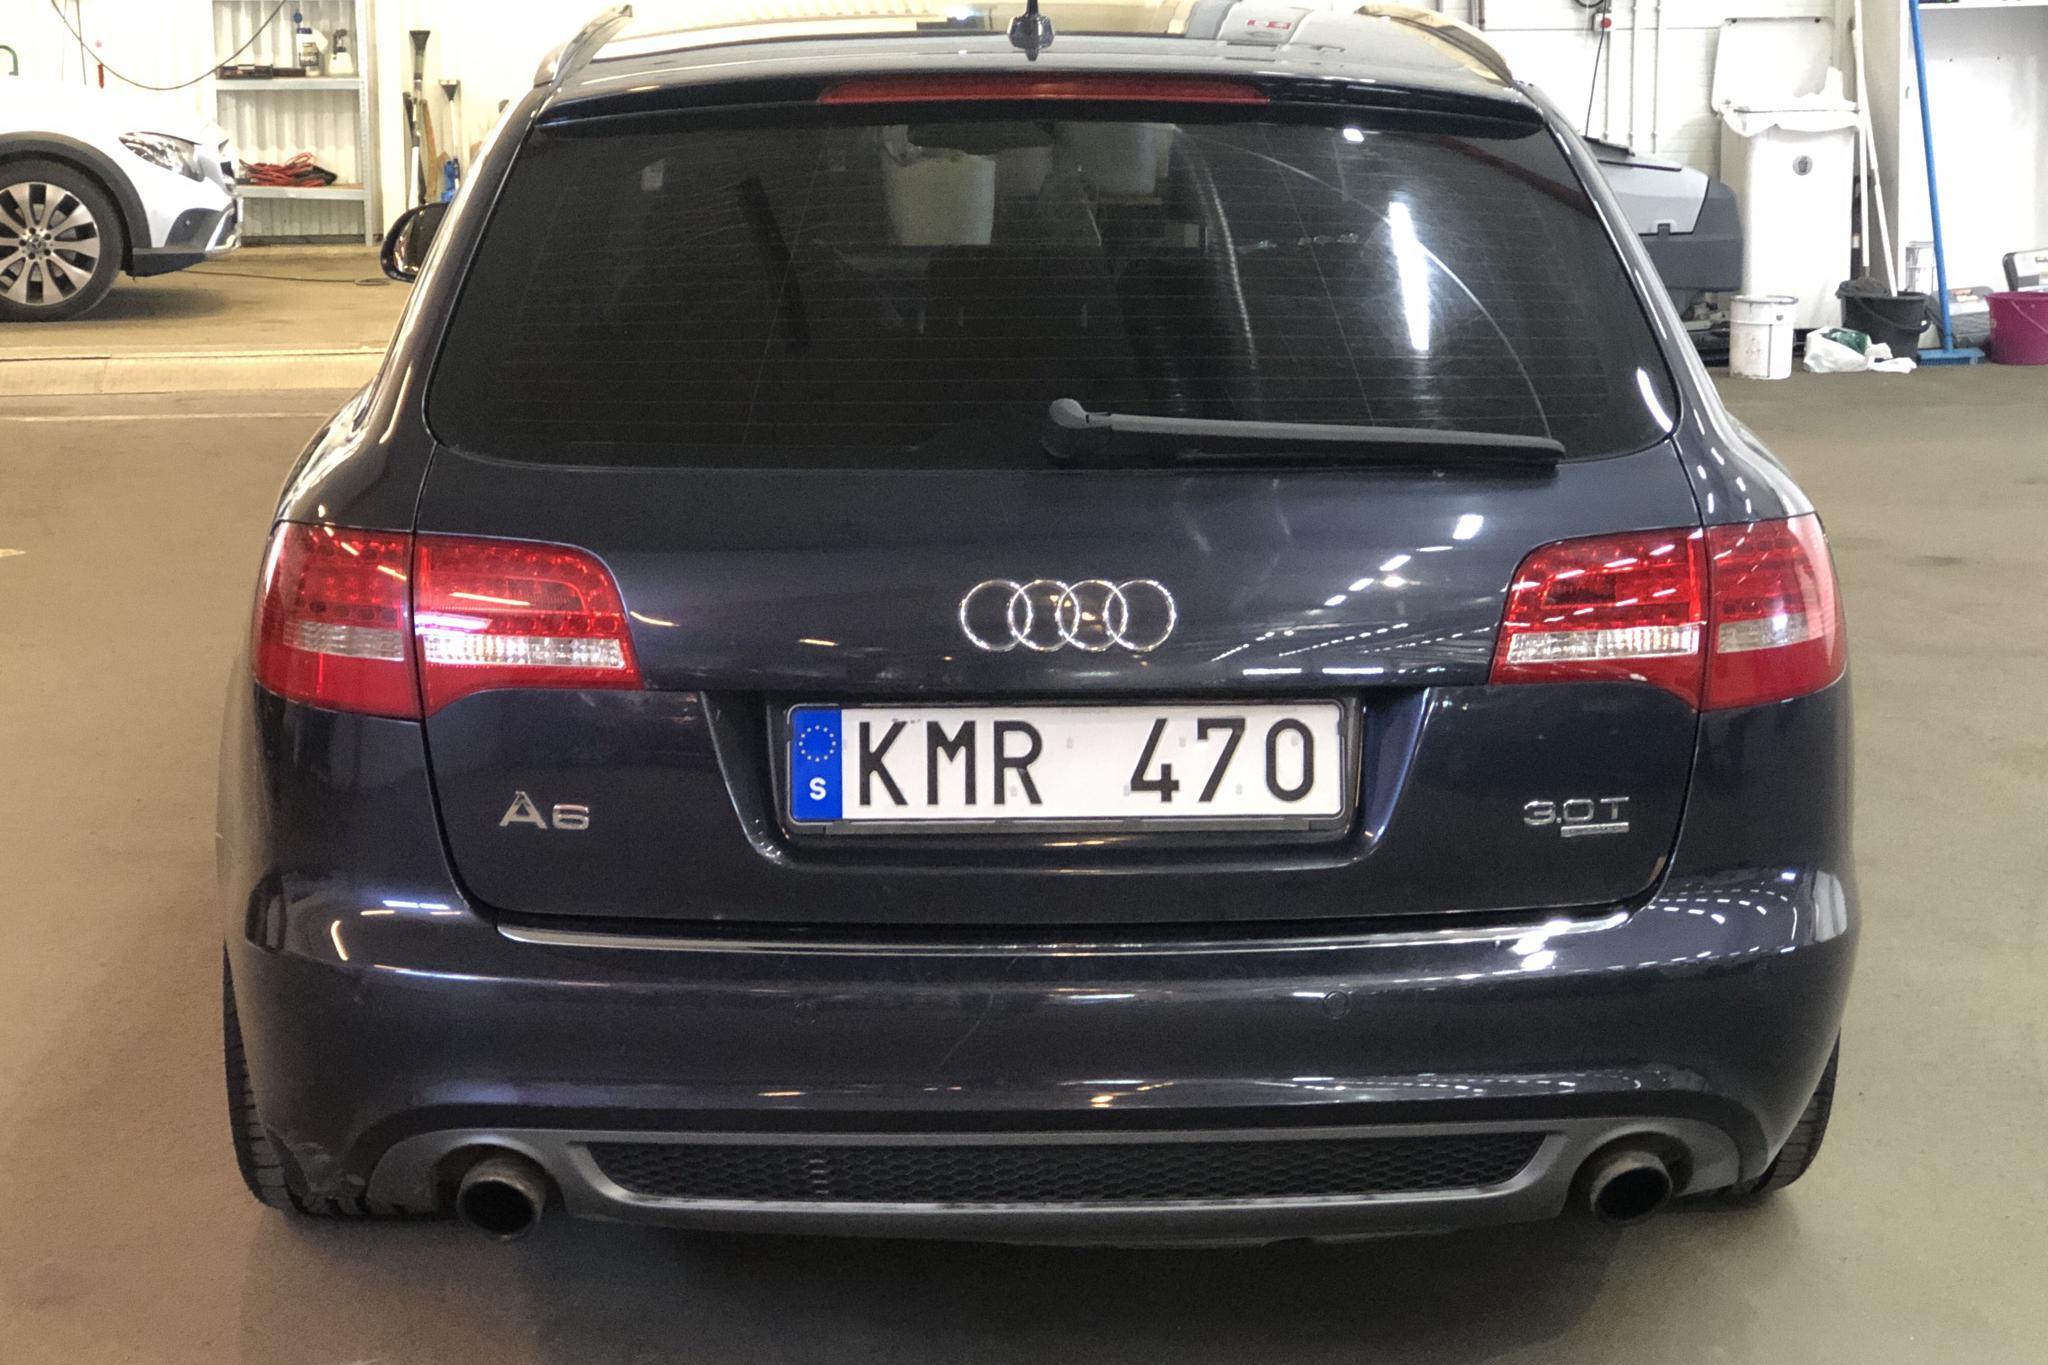 Audi A6 3.0 TFSI Avant quattro (290hk) - 200 840 km - Automatic - blue - 2009